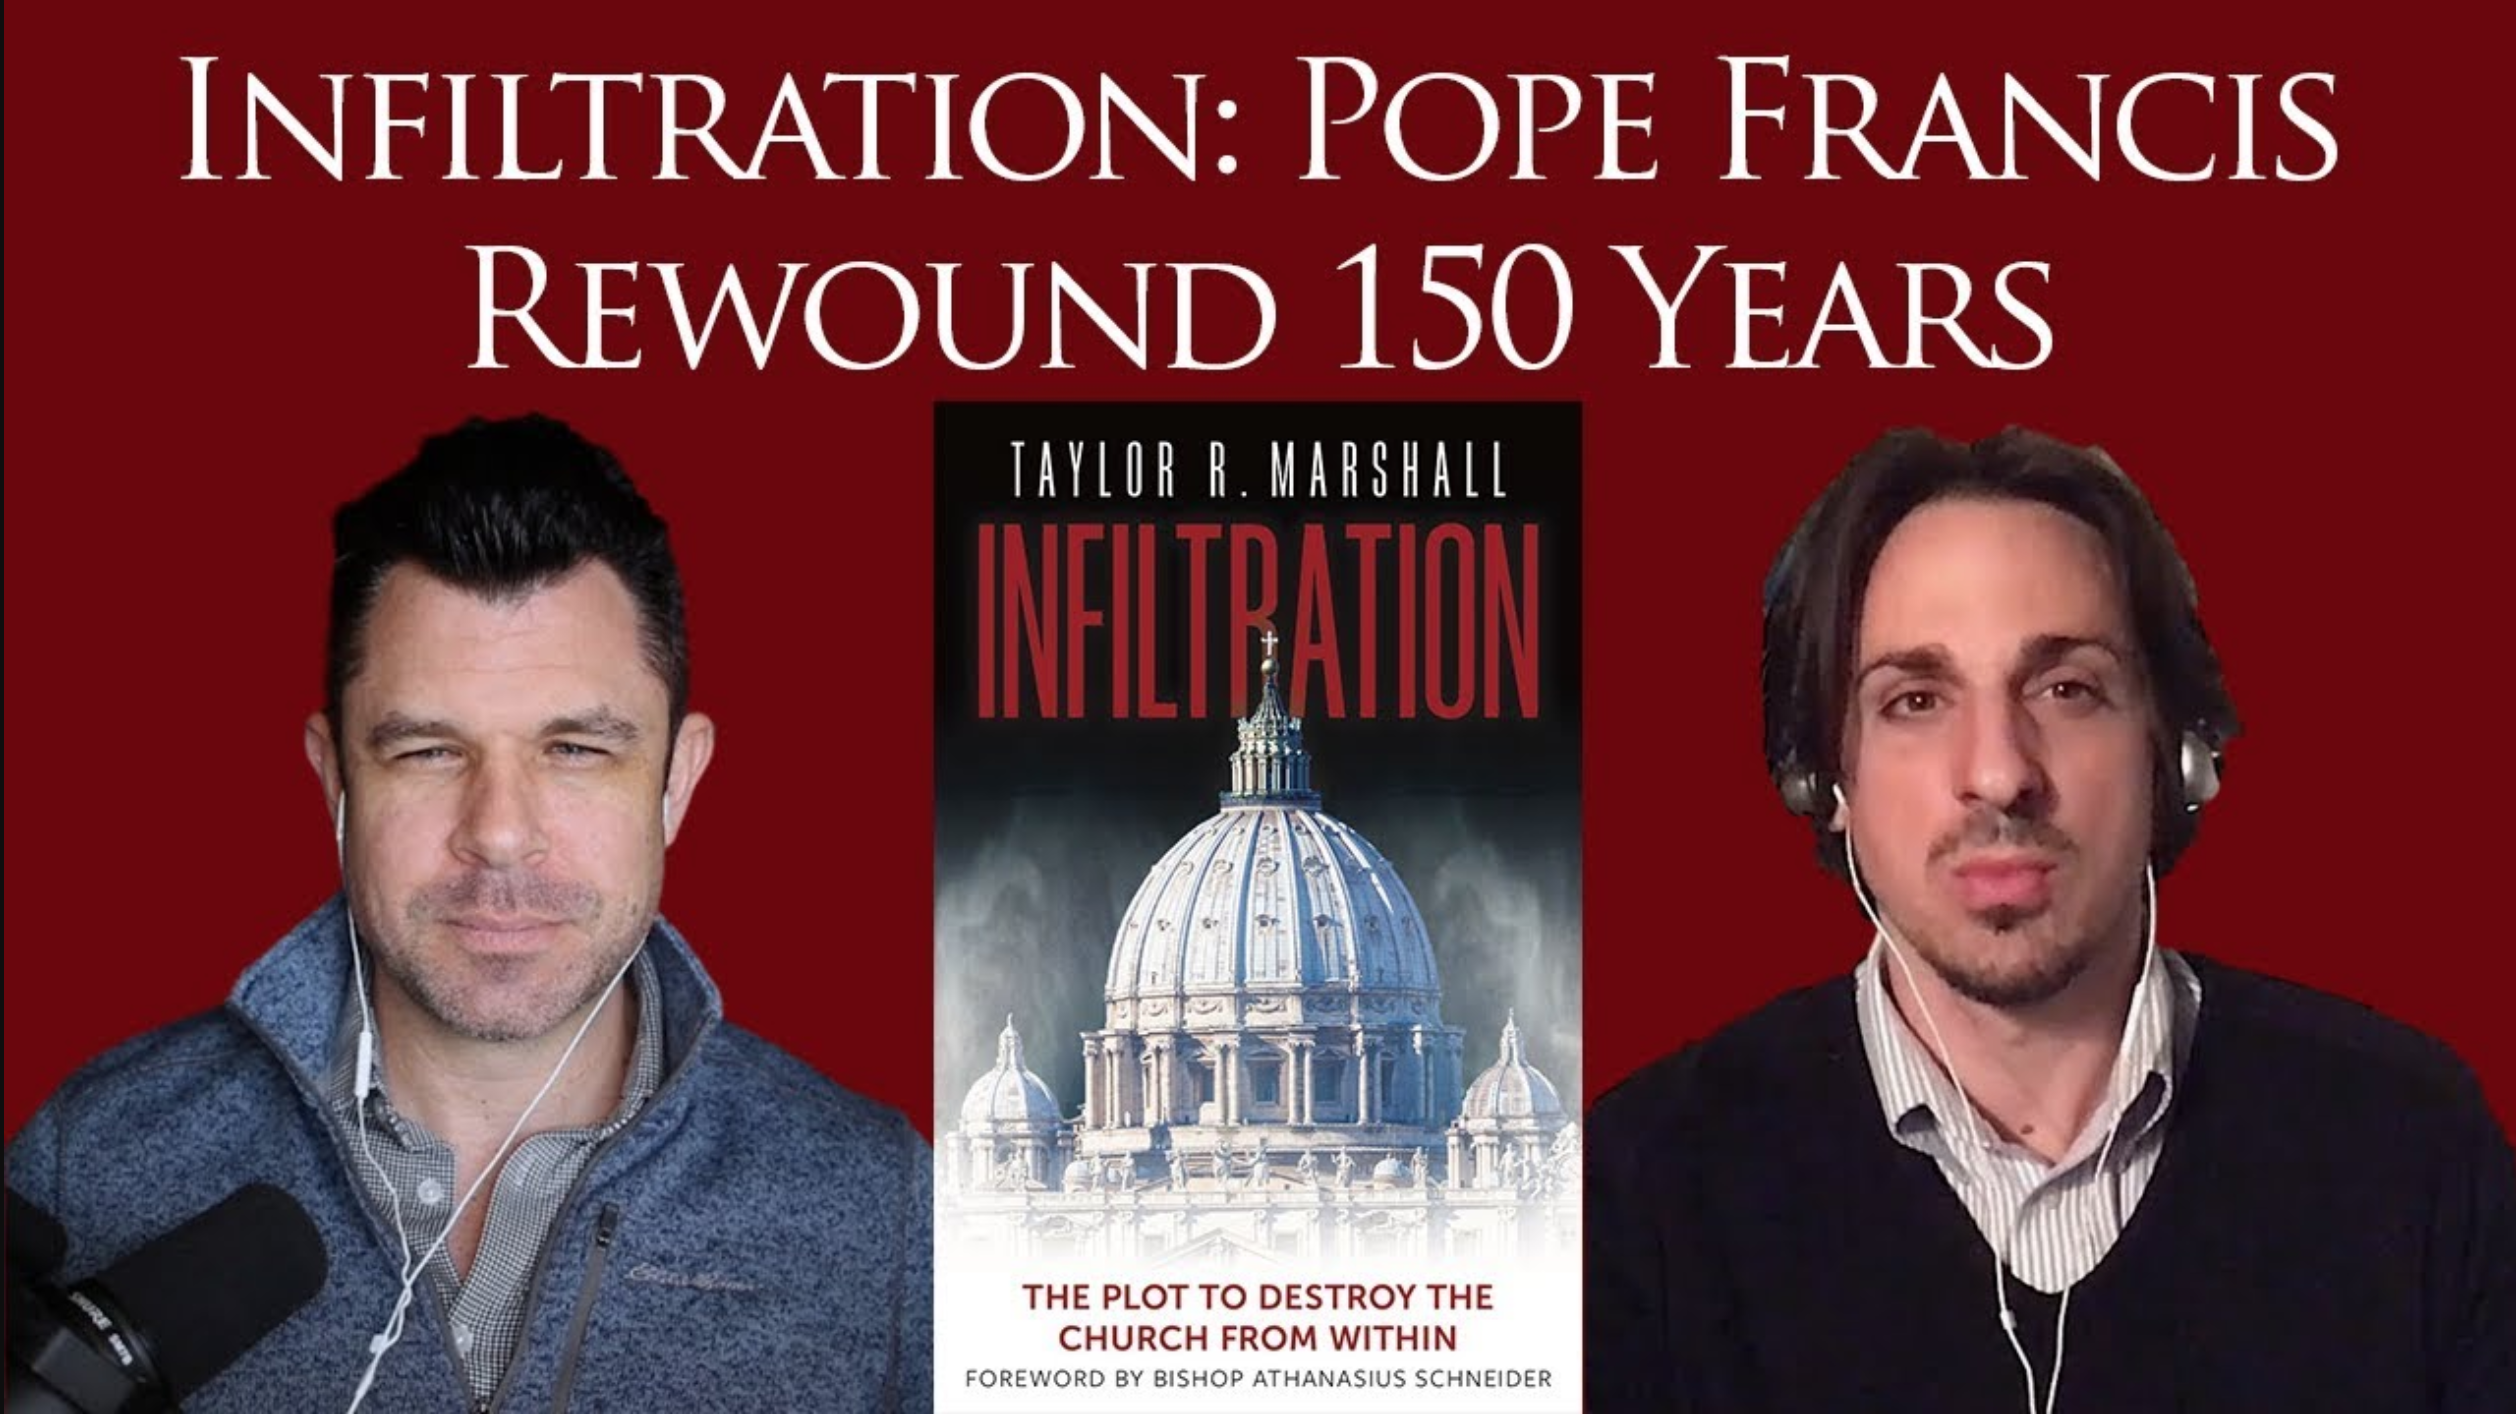 Taylor Marshall Infiltration